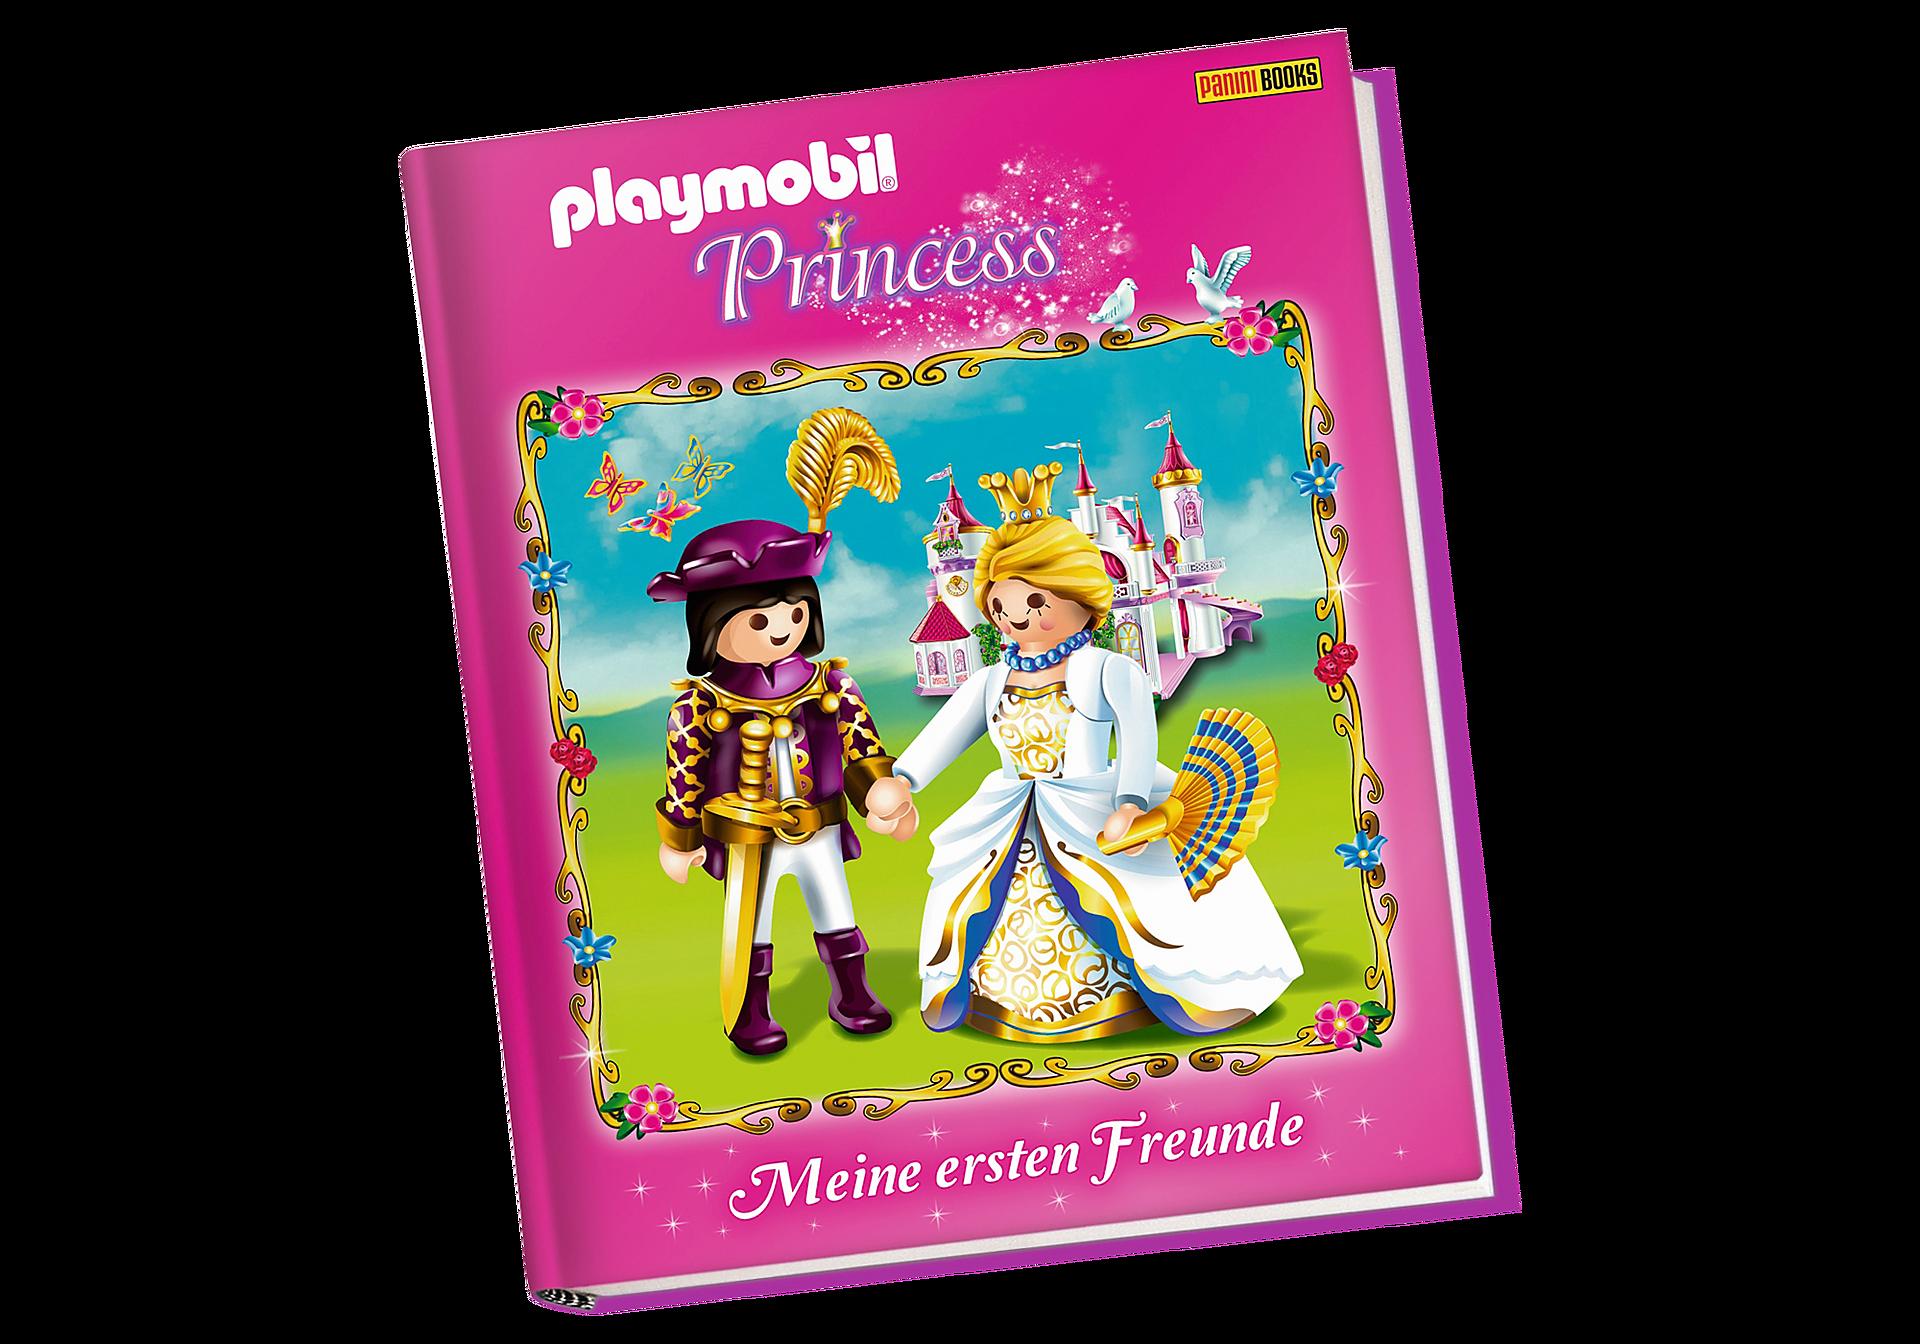 http://media.playmobil.com/i/playmobil/80379_product_detail/Freundealbum - Meine ersten Freunde (Princess)